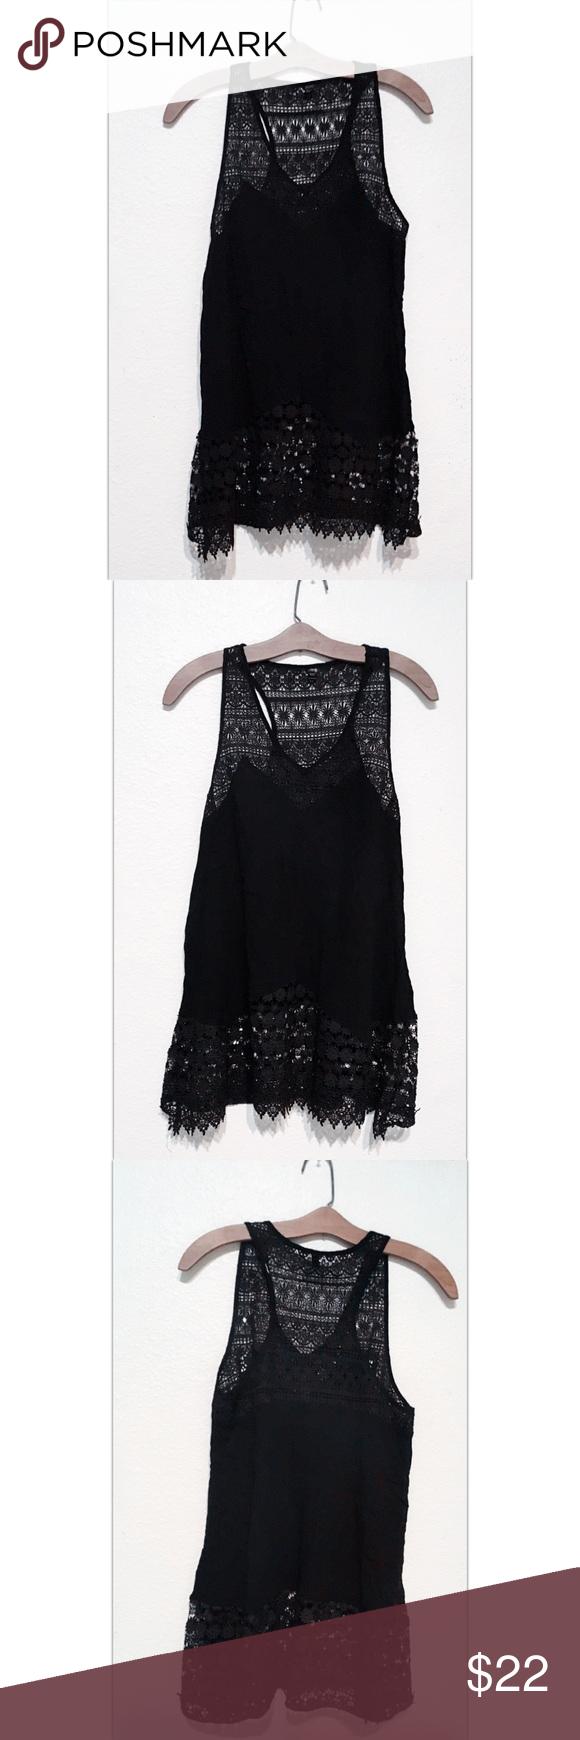 Black Lace Cover Up Mini Dress Black Lace Cover Up Mini Dress Size Medium Pacsun Solid Black Semi See Through Mini Dress Mini Black Dress Lace Dress Black [ 1740 x 580 Pixel ]